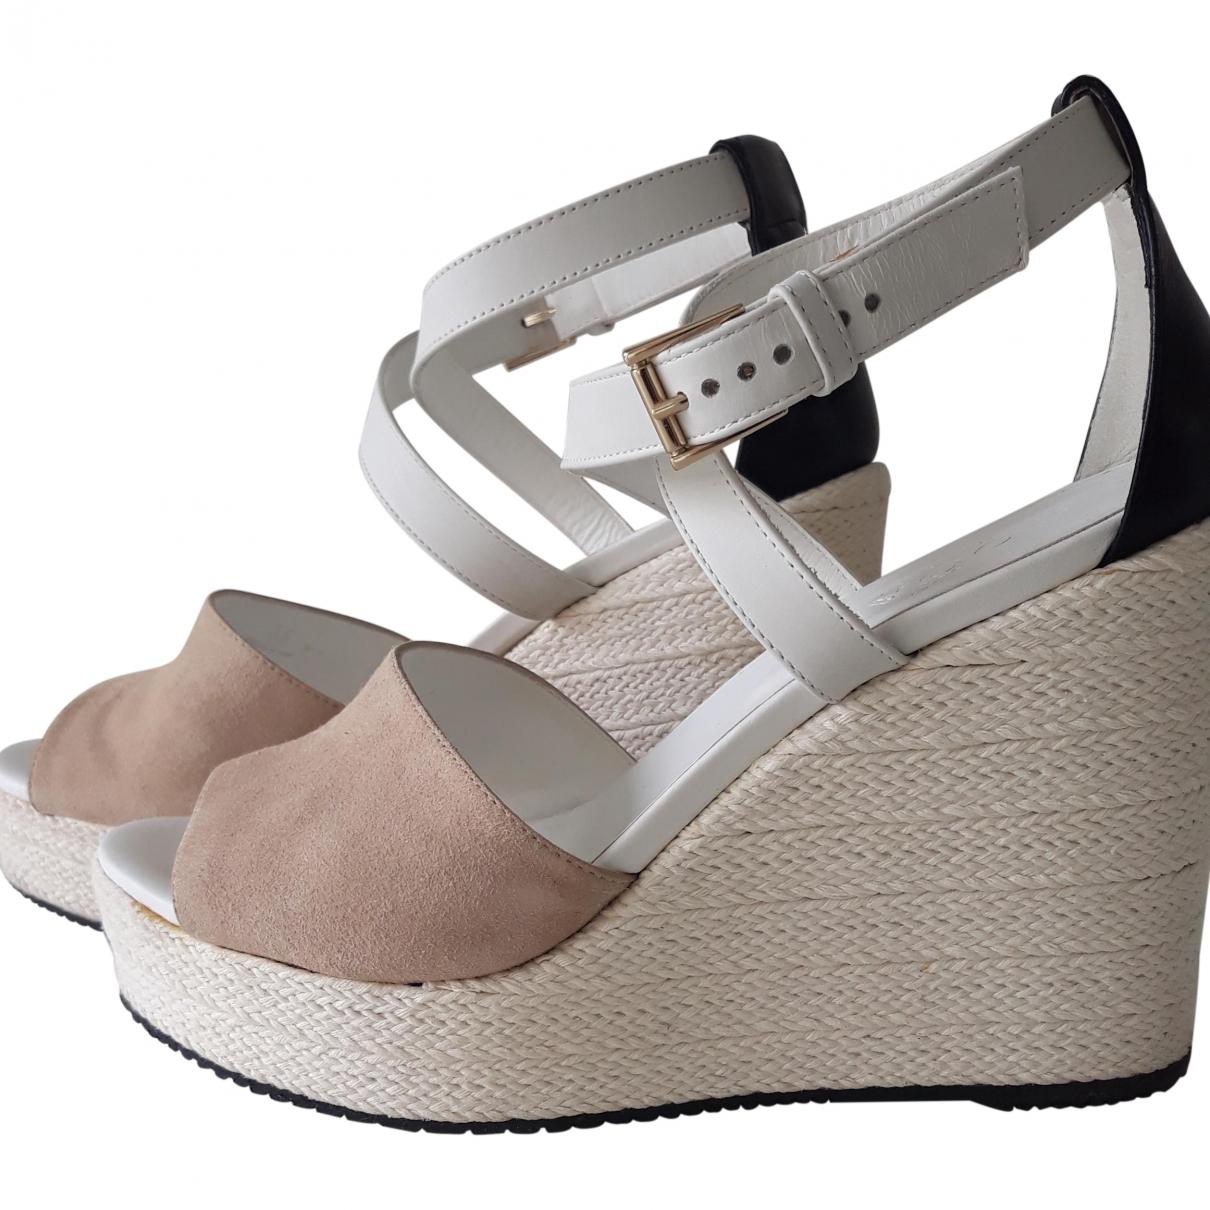 Hogan \N Beige Leather Sandals for Women 38 EU